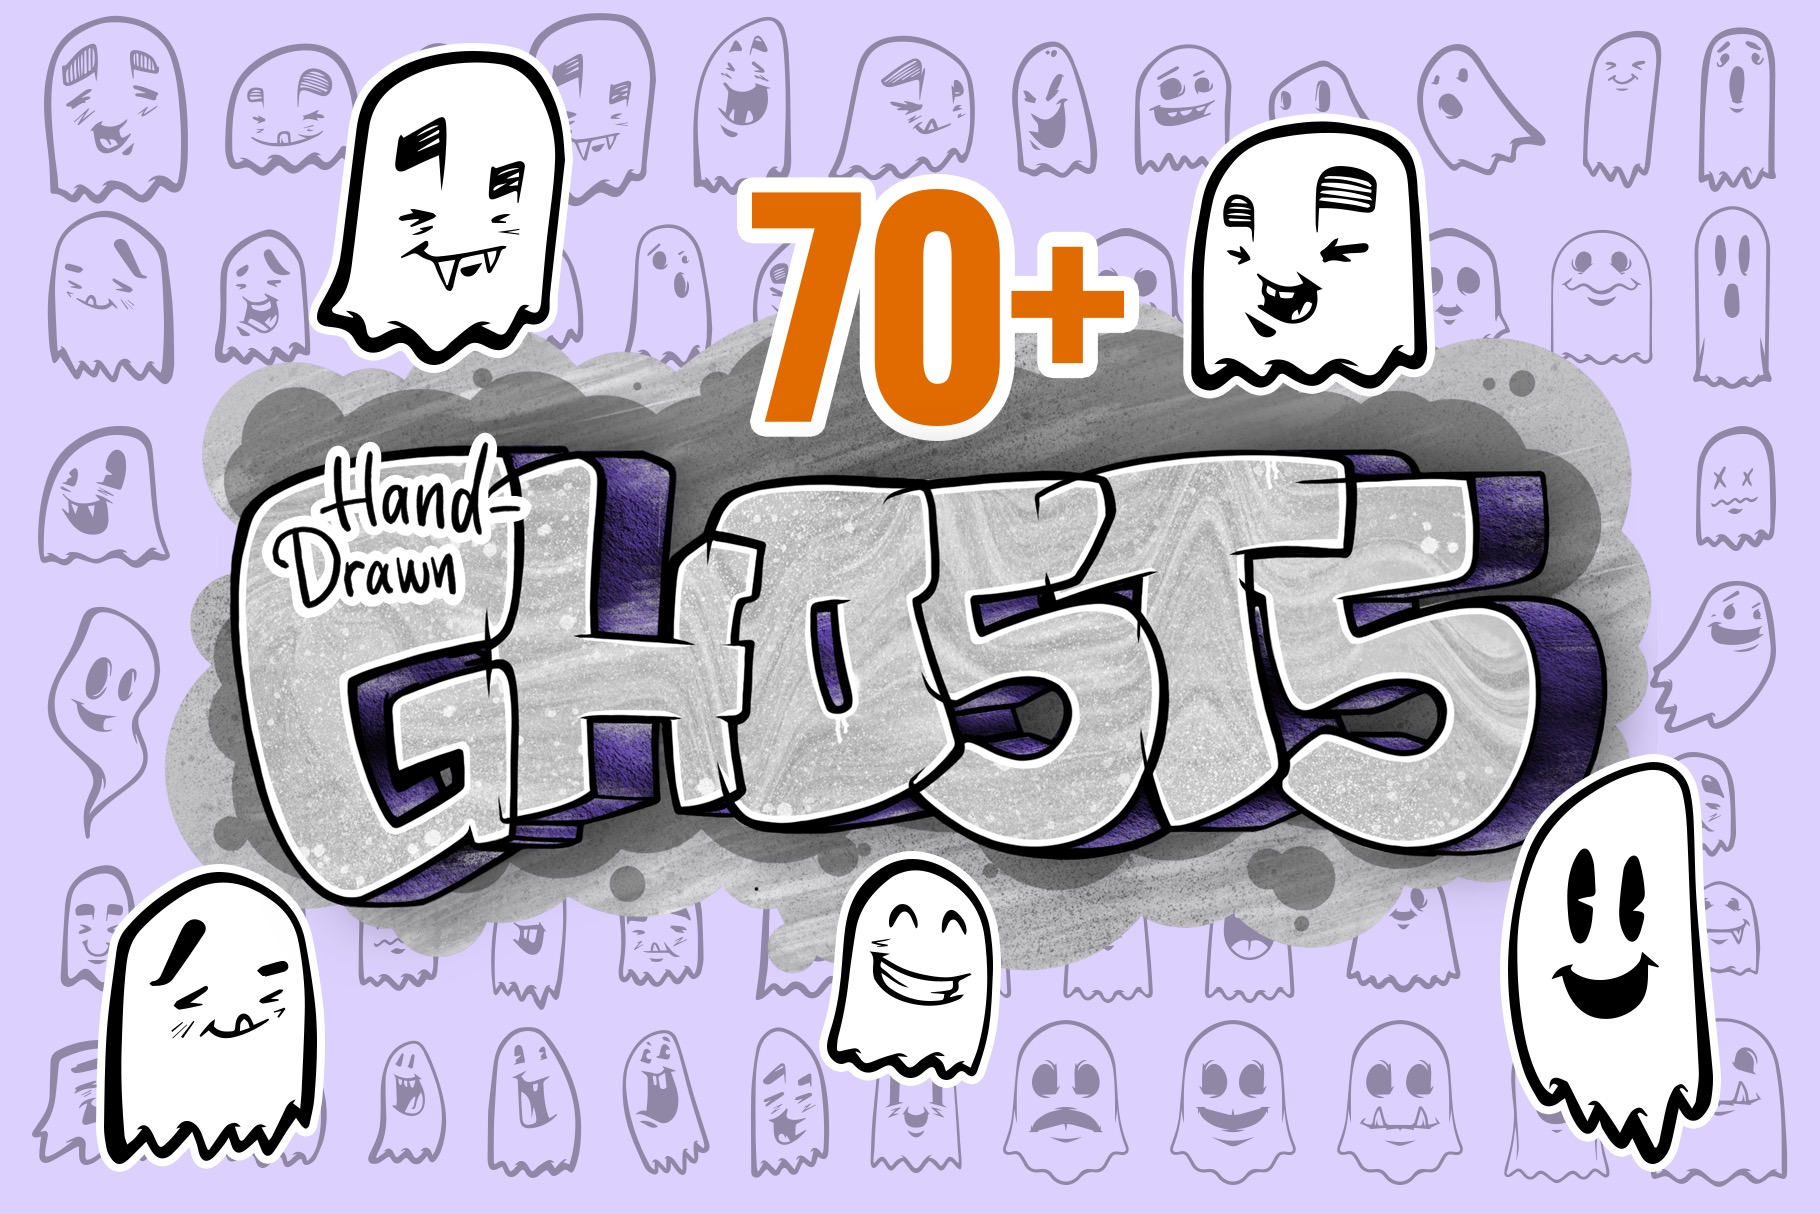 70+ Hand Drawn Ghost Illustrations